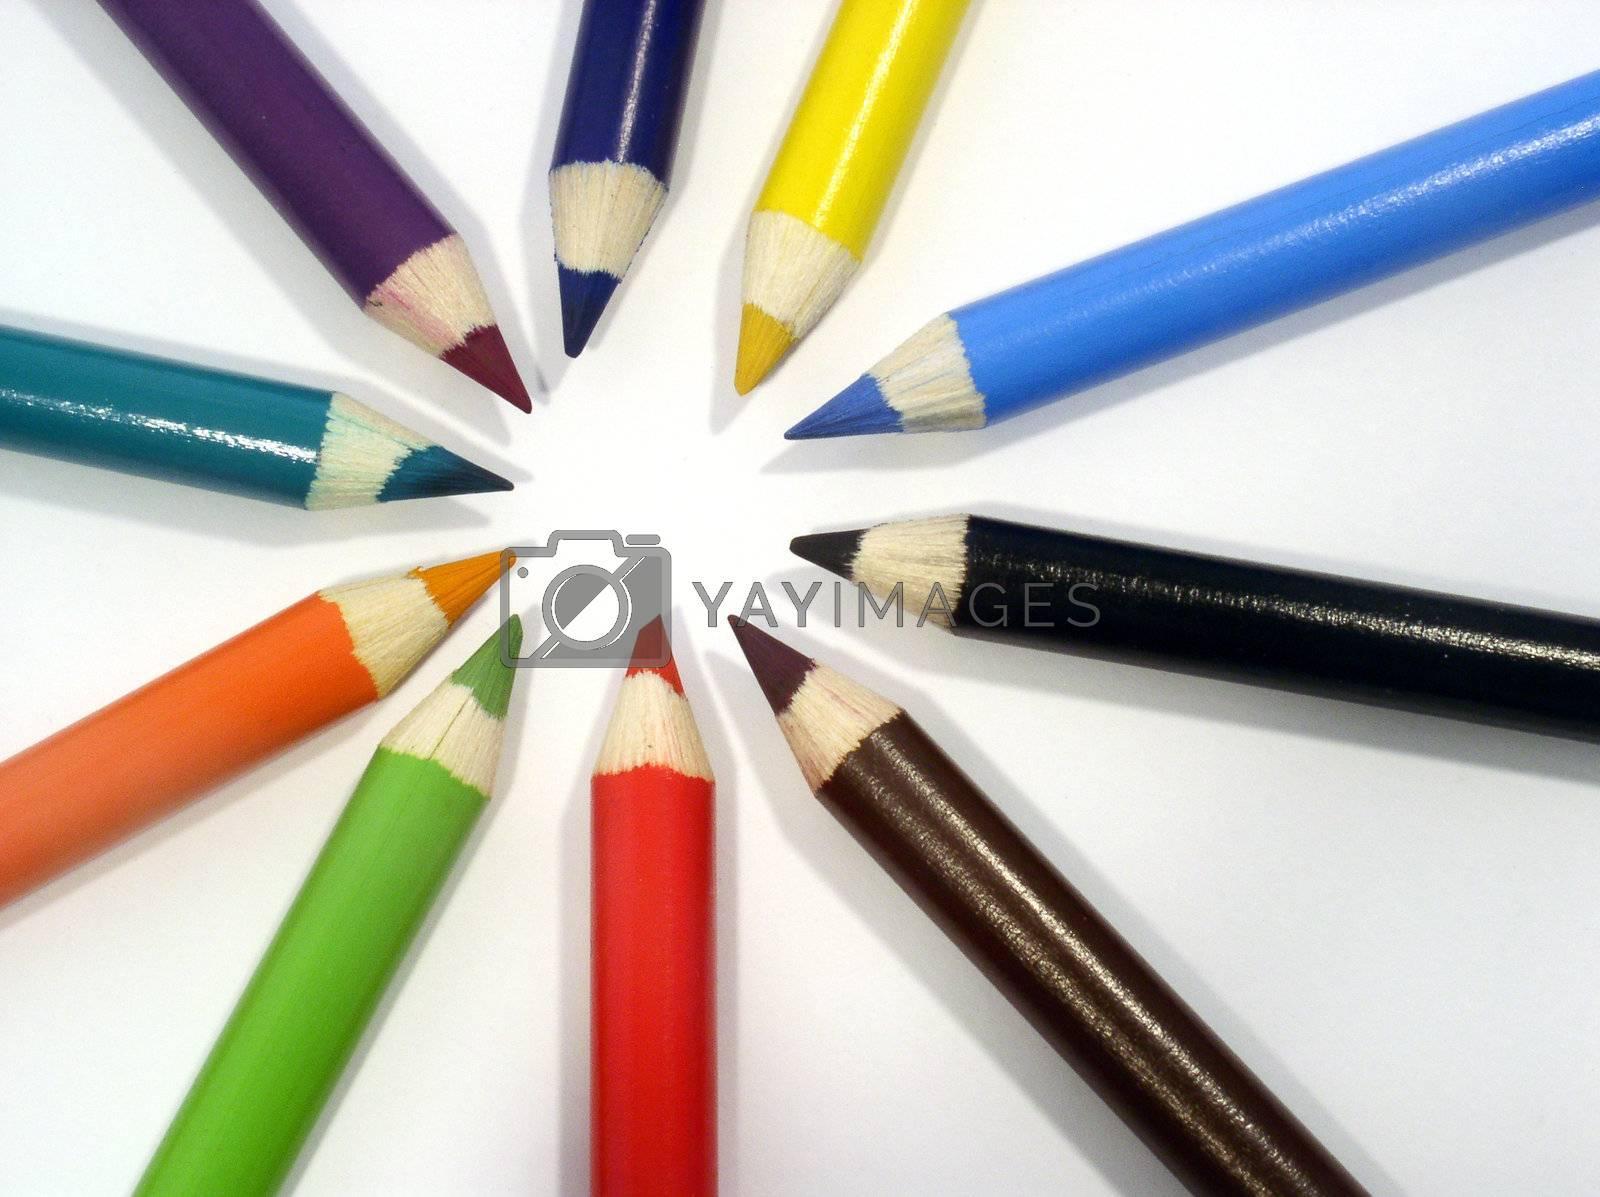 Royalty free image of crayons by kapp